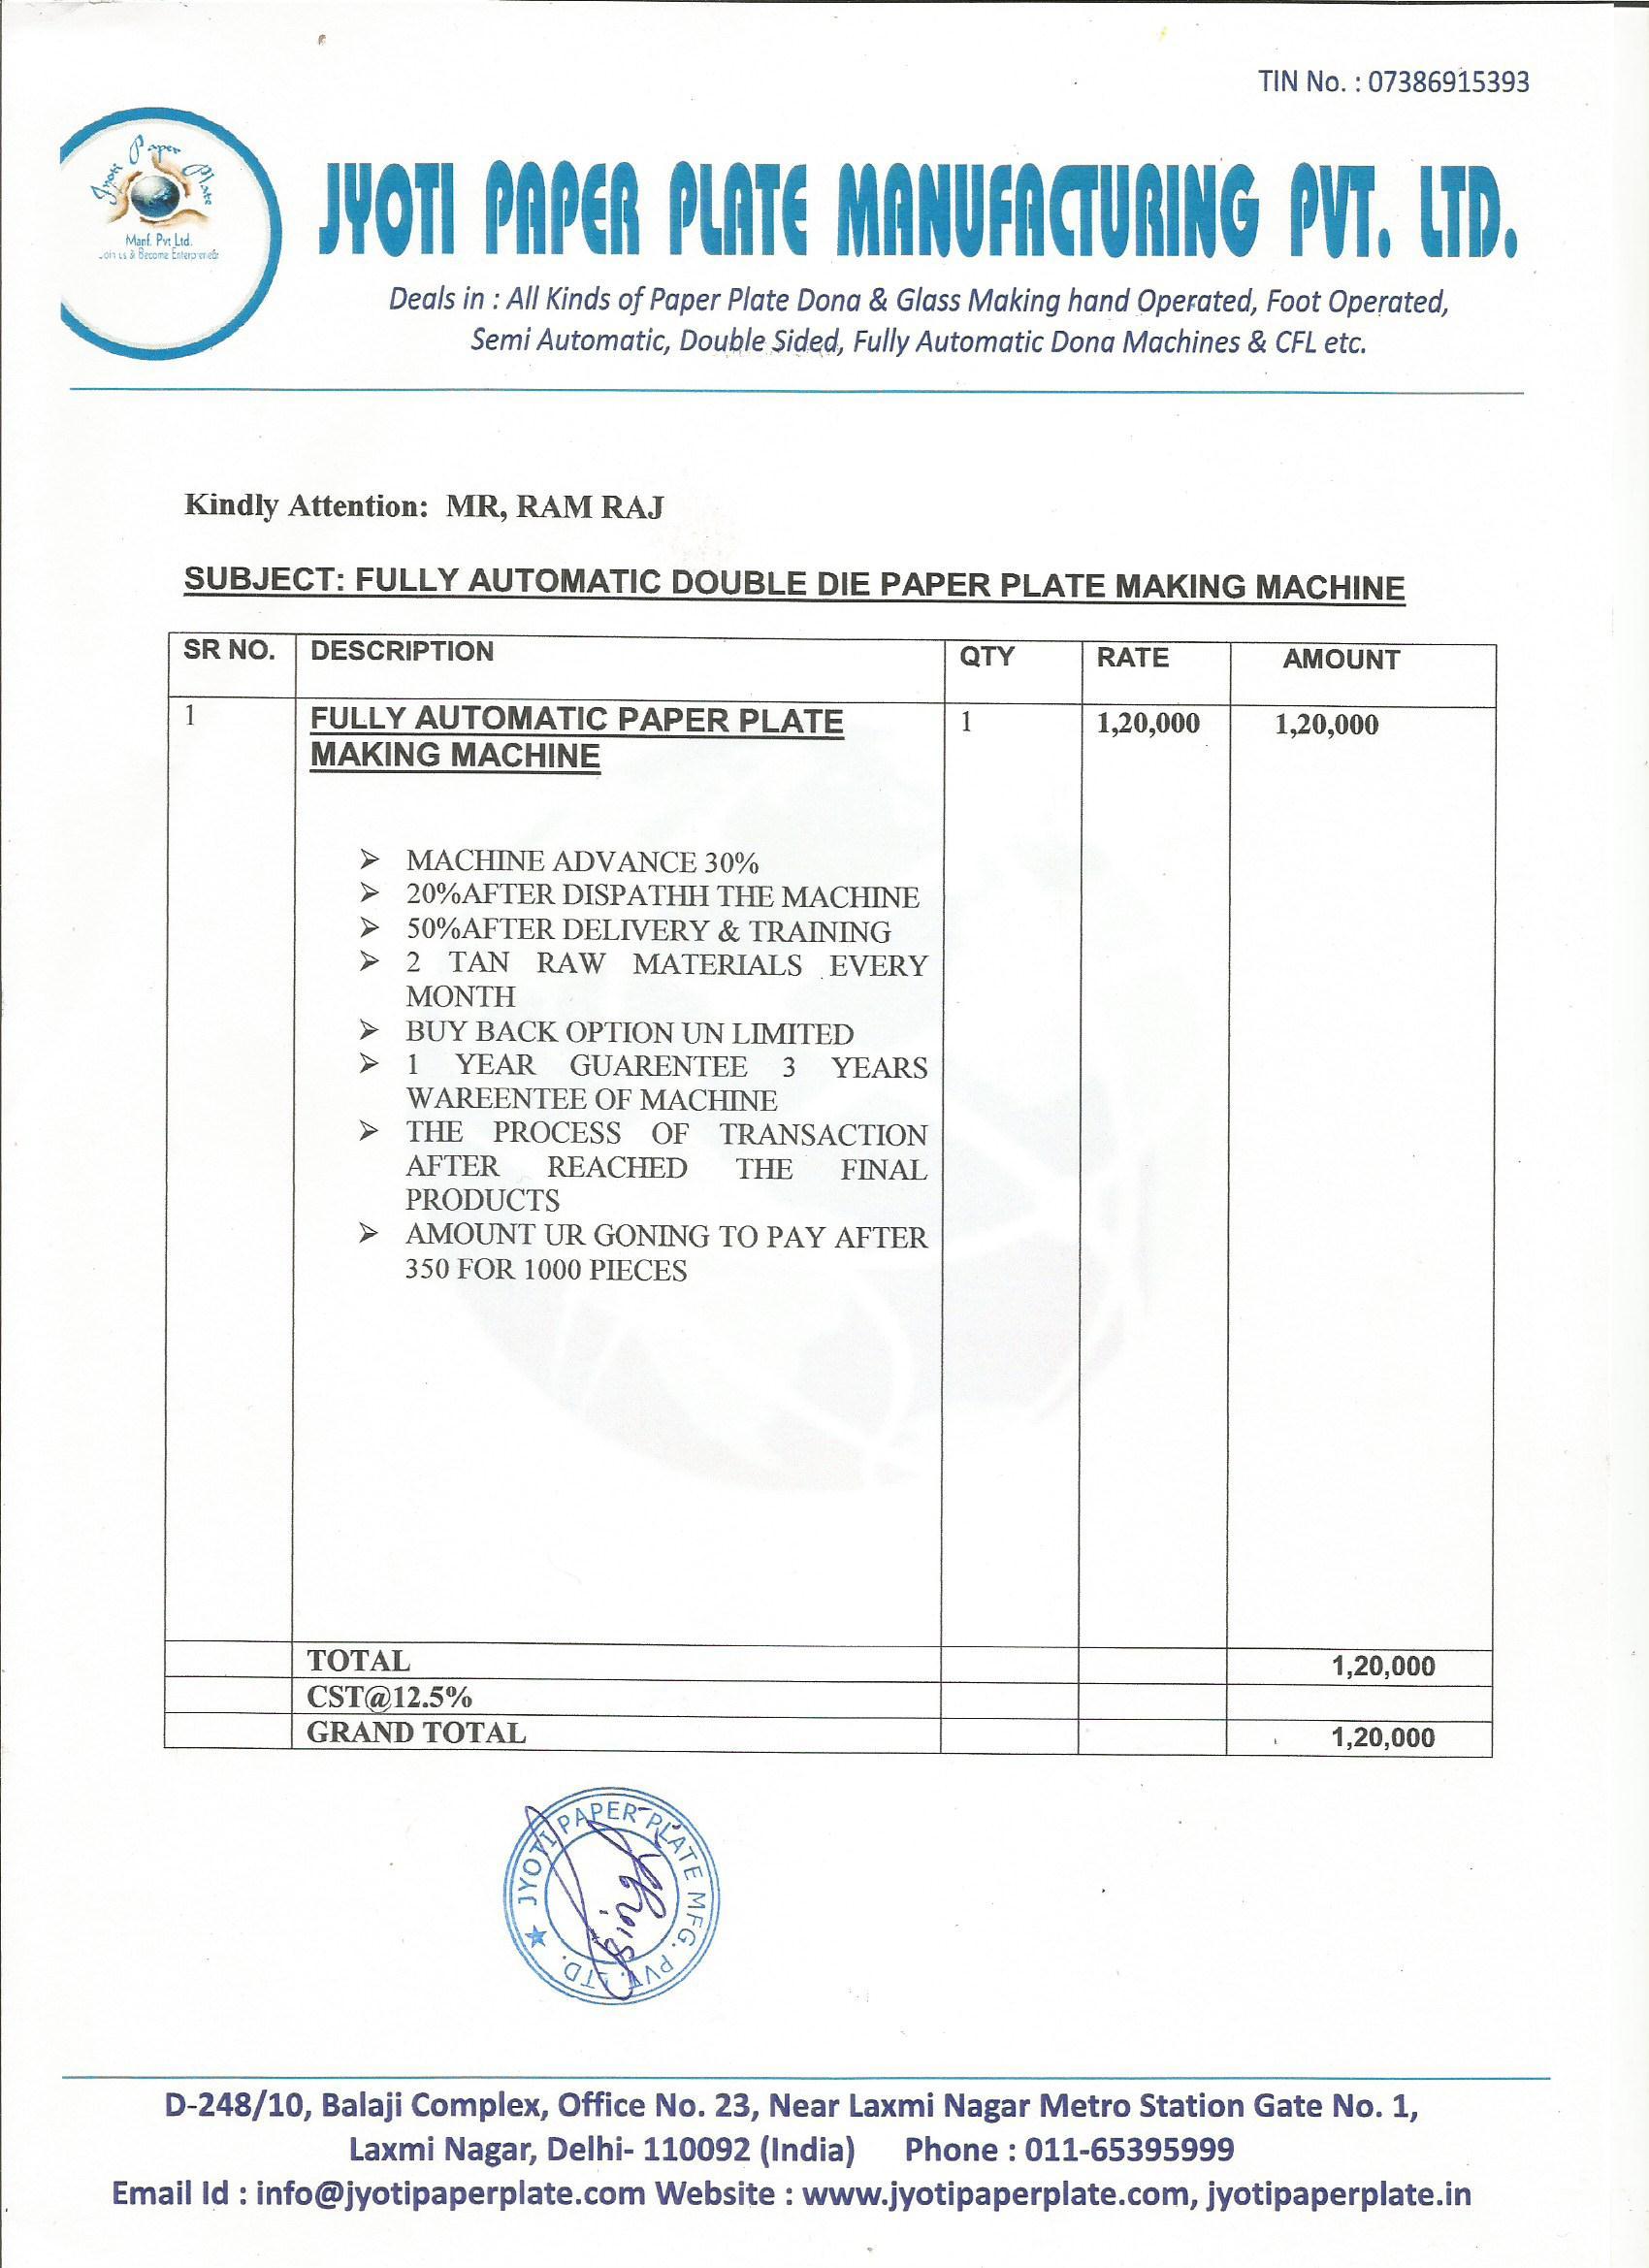 JYOTHI PAPER PLATE MANUFACTURING PVT LTD NOT GETTING PROPER RESPONSE ...